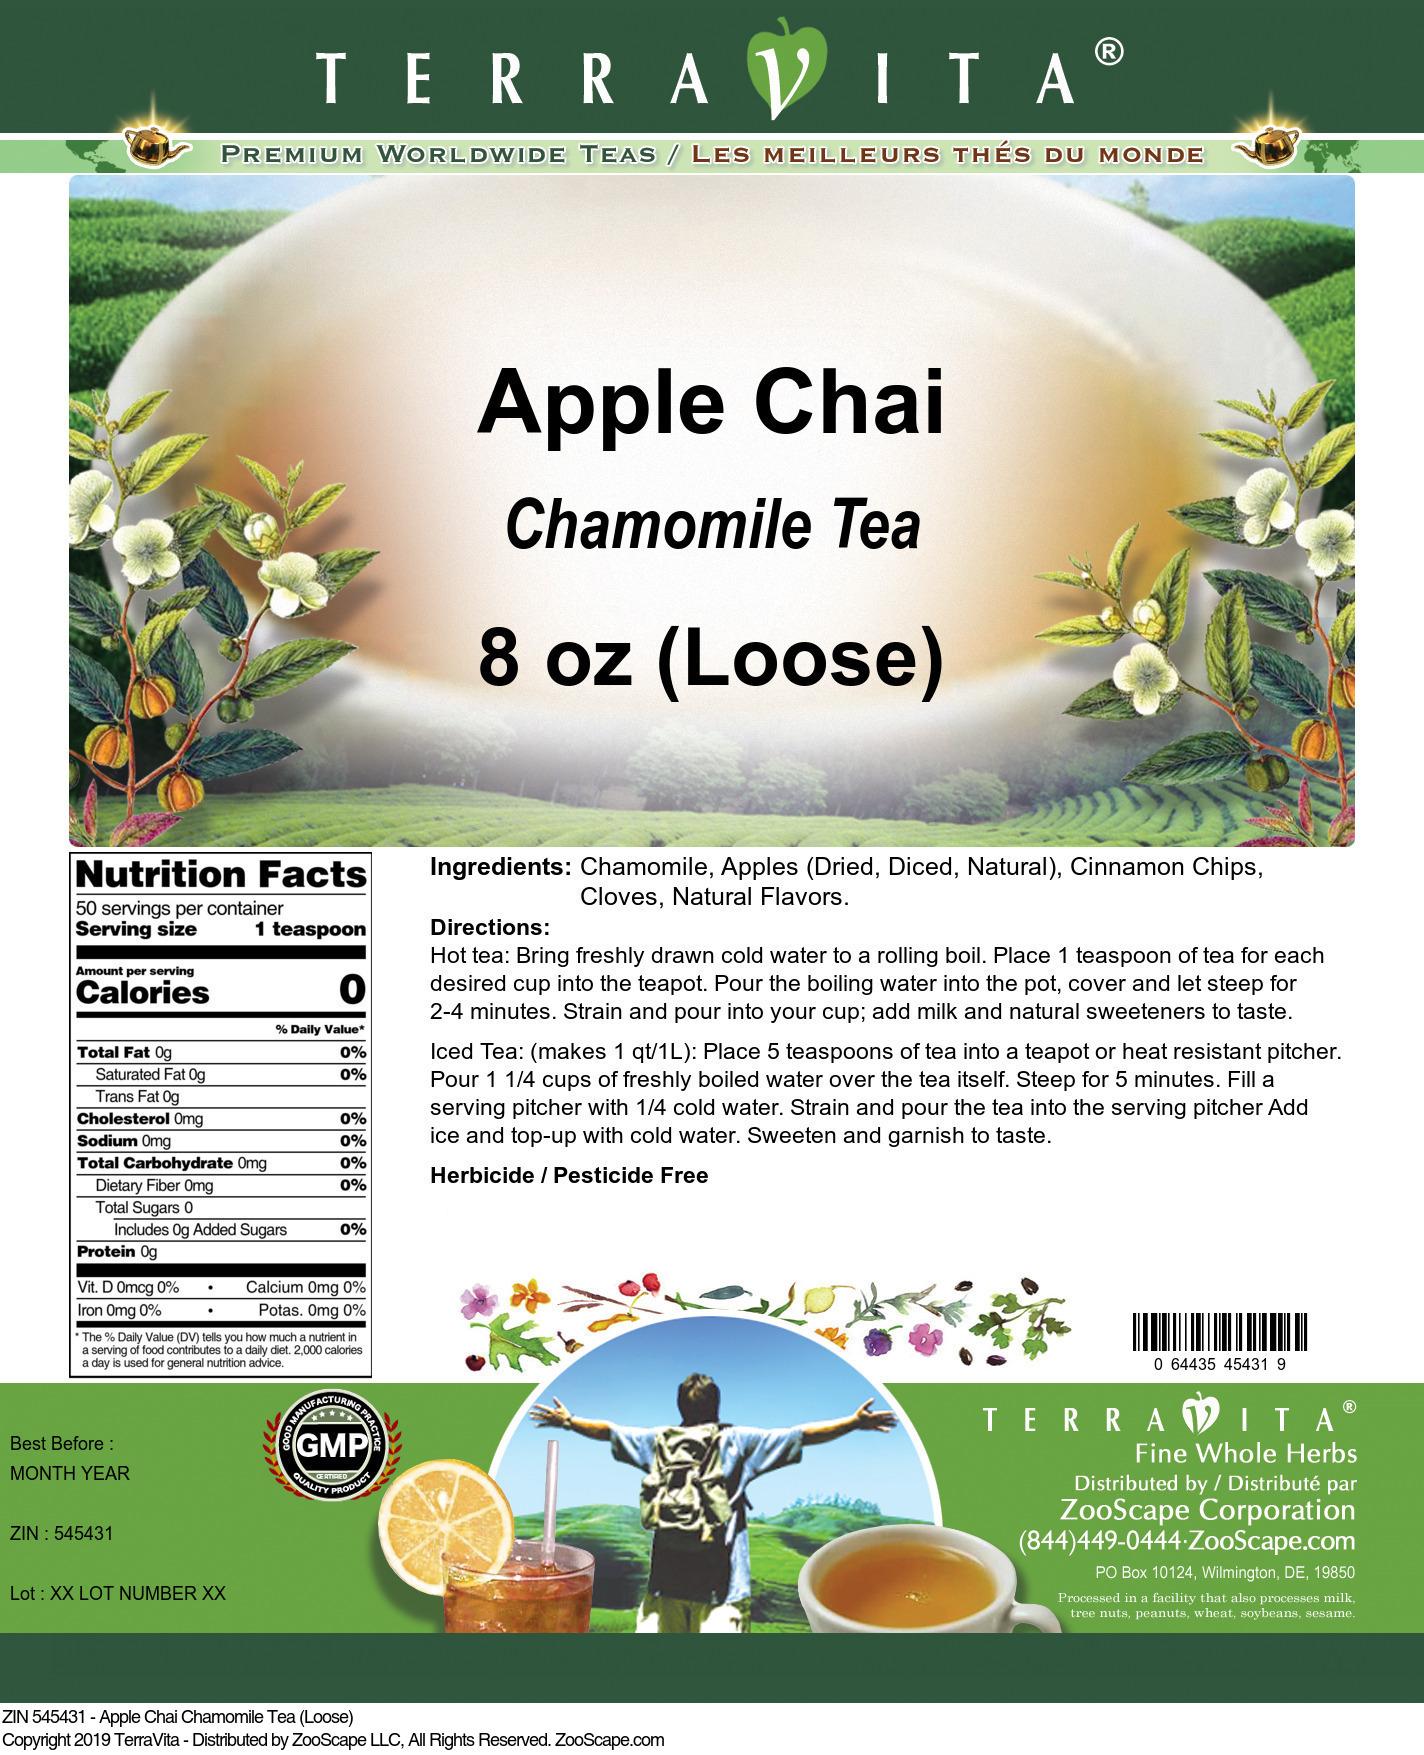 Apple Chai Chamomile Tea